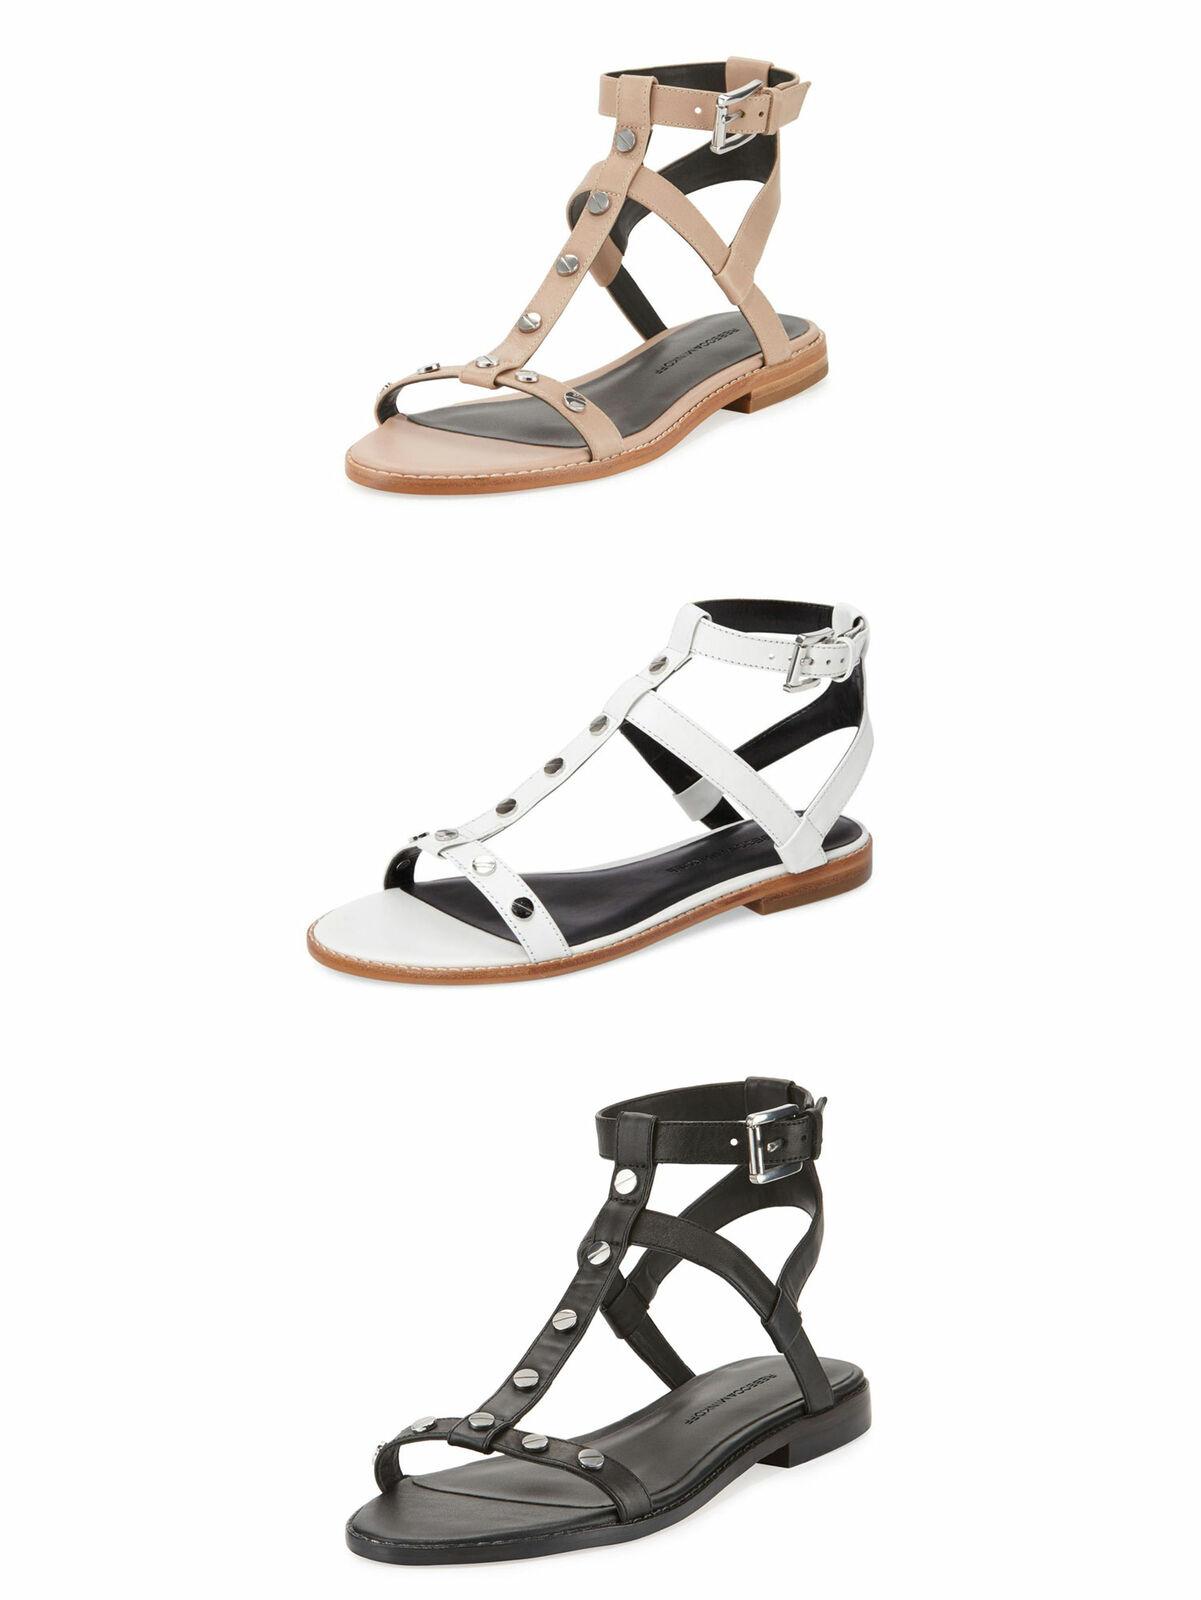 REBECCA MINKOFF Women's Sandy Leather Studded Sandals  125 NIB